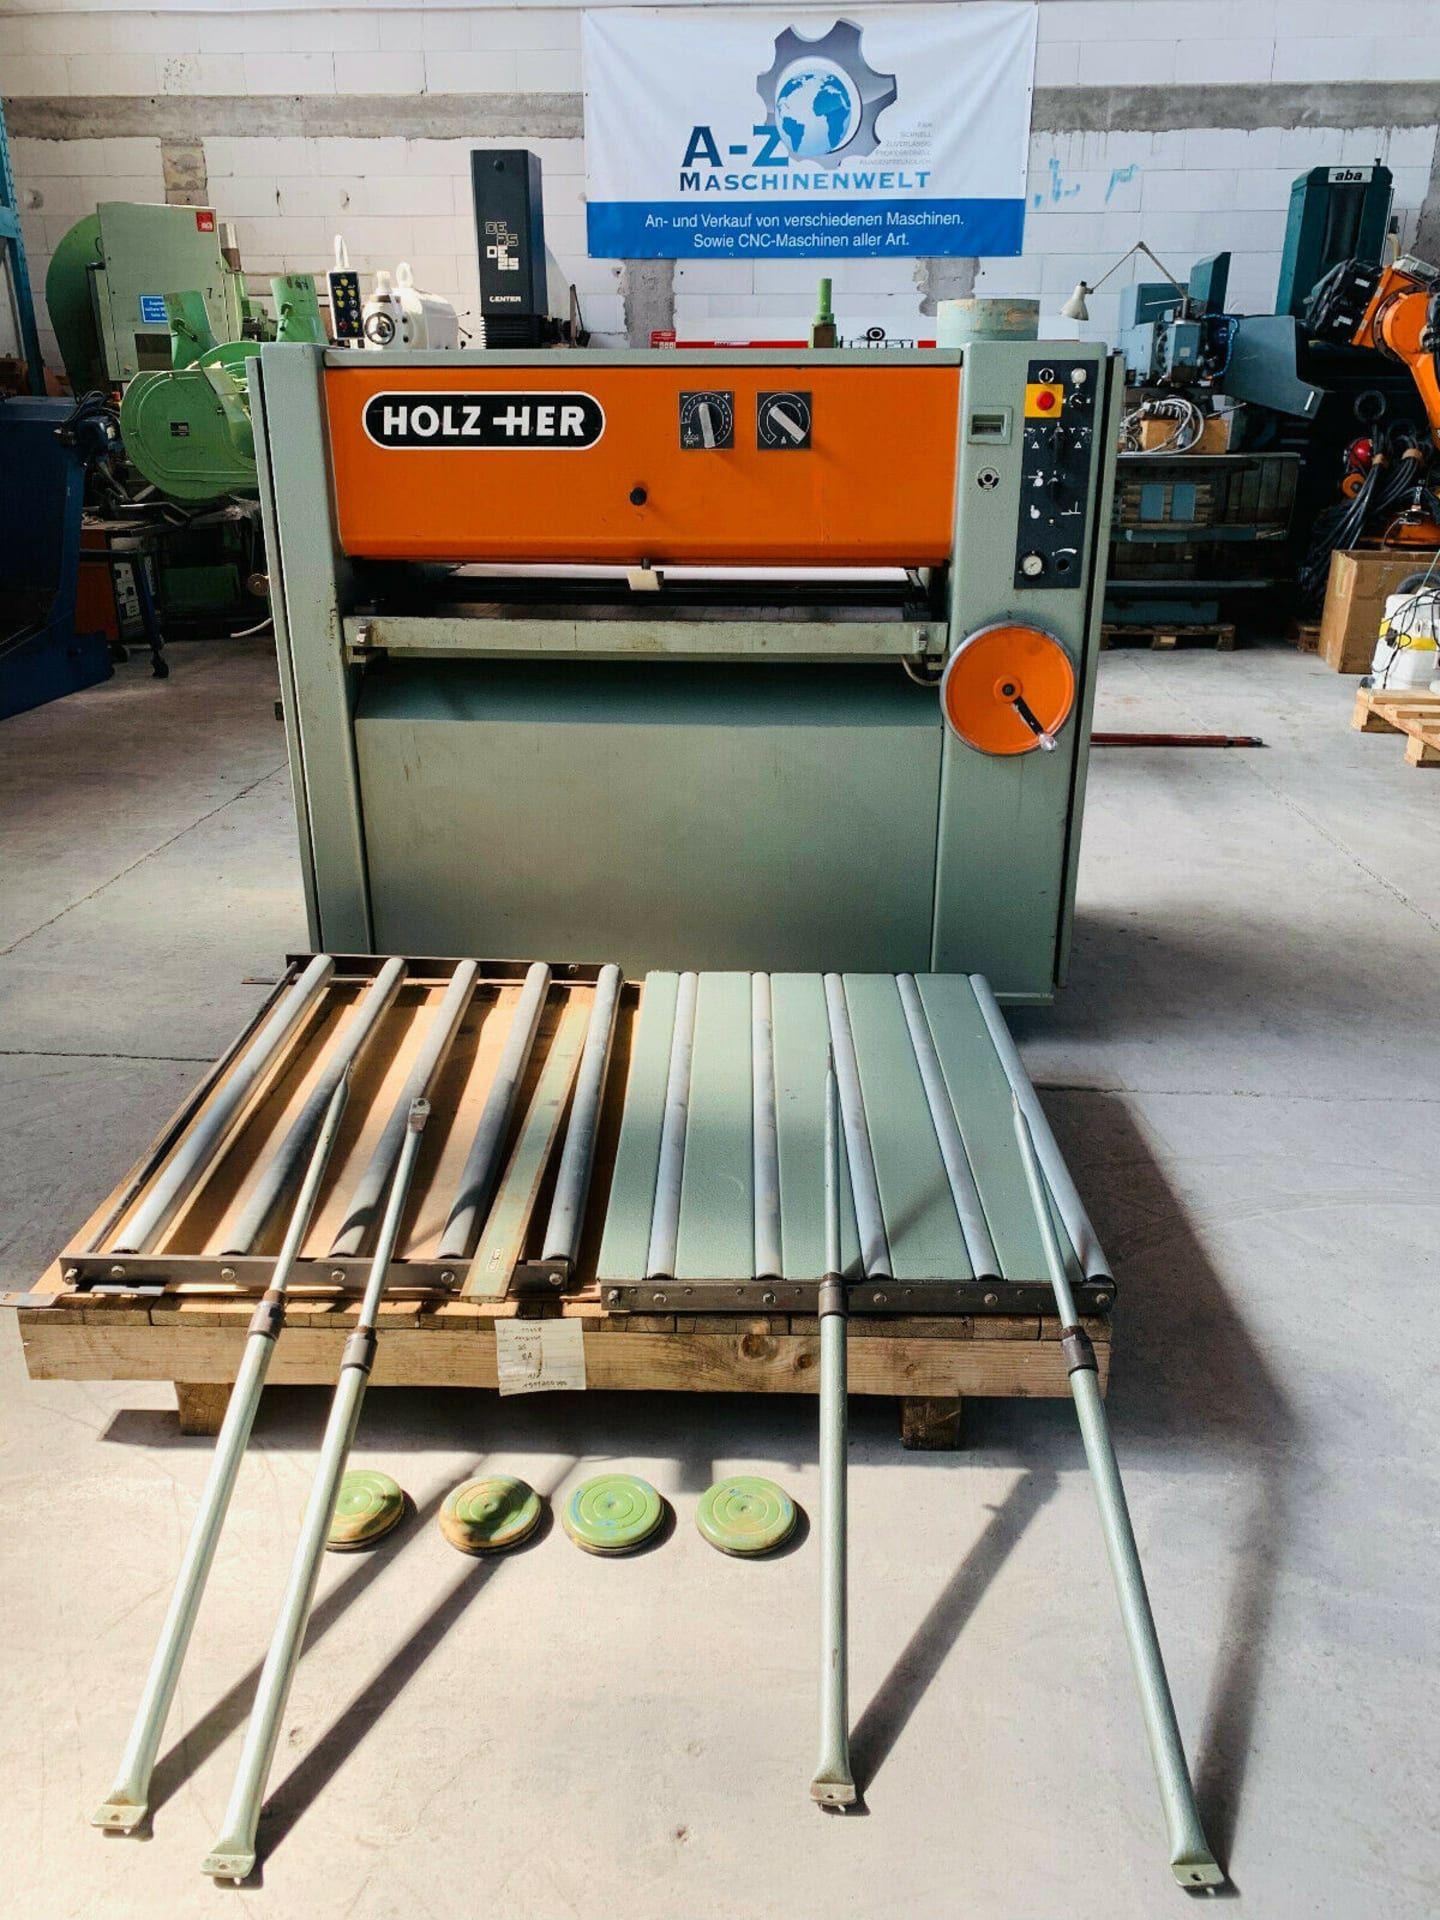 HOLZHER 1370 Breitbandschleifmaschine